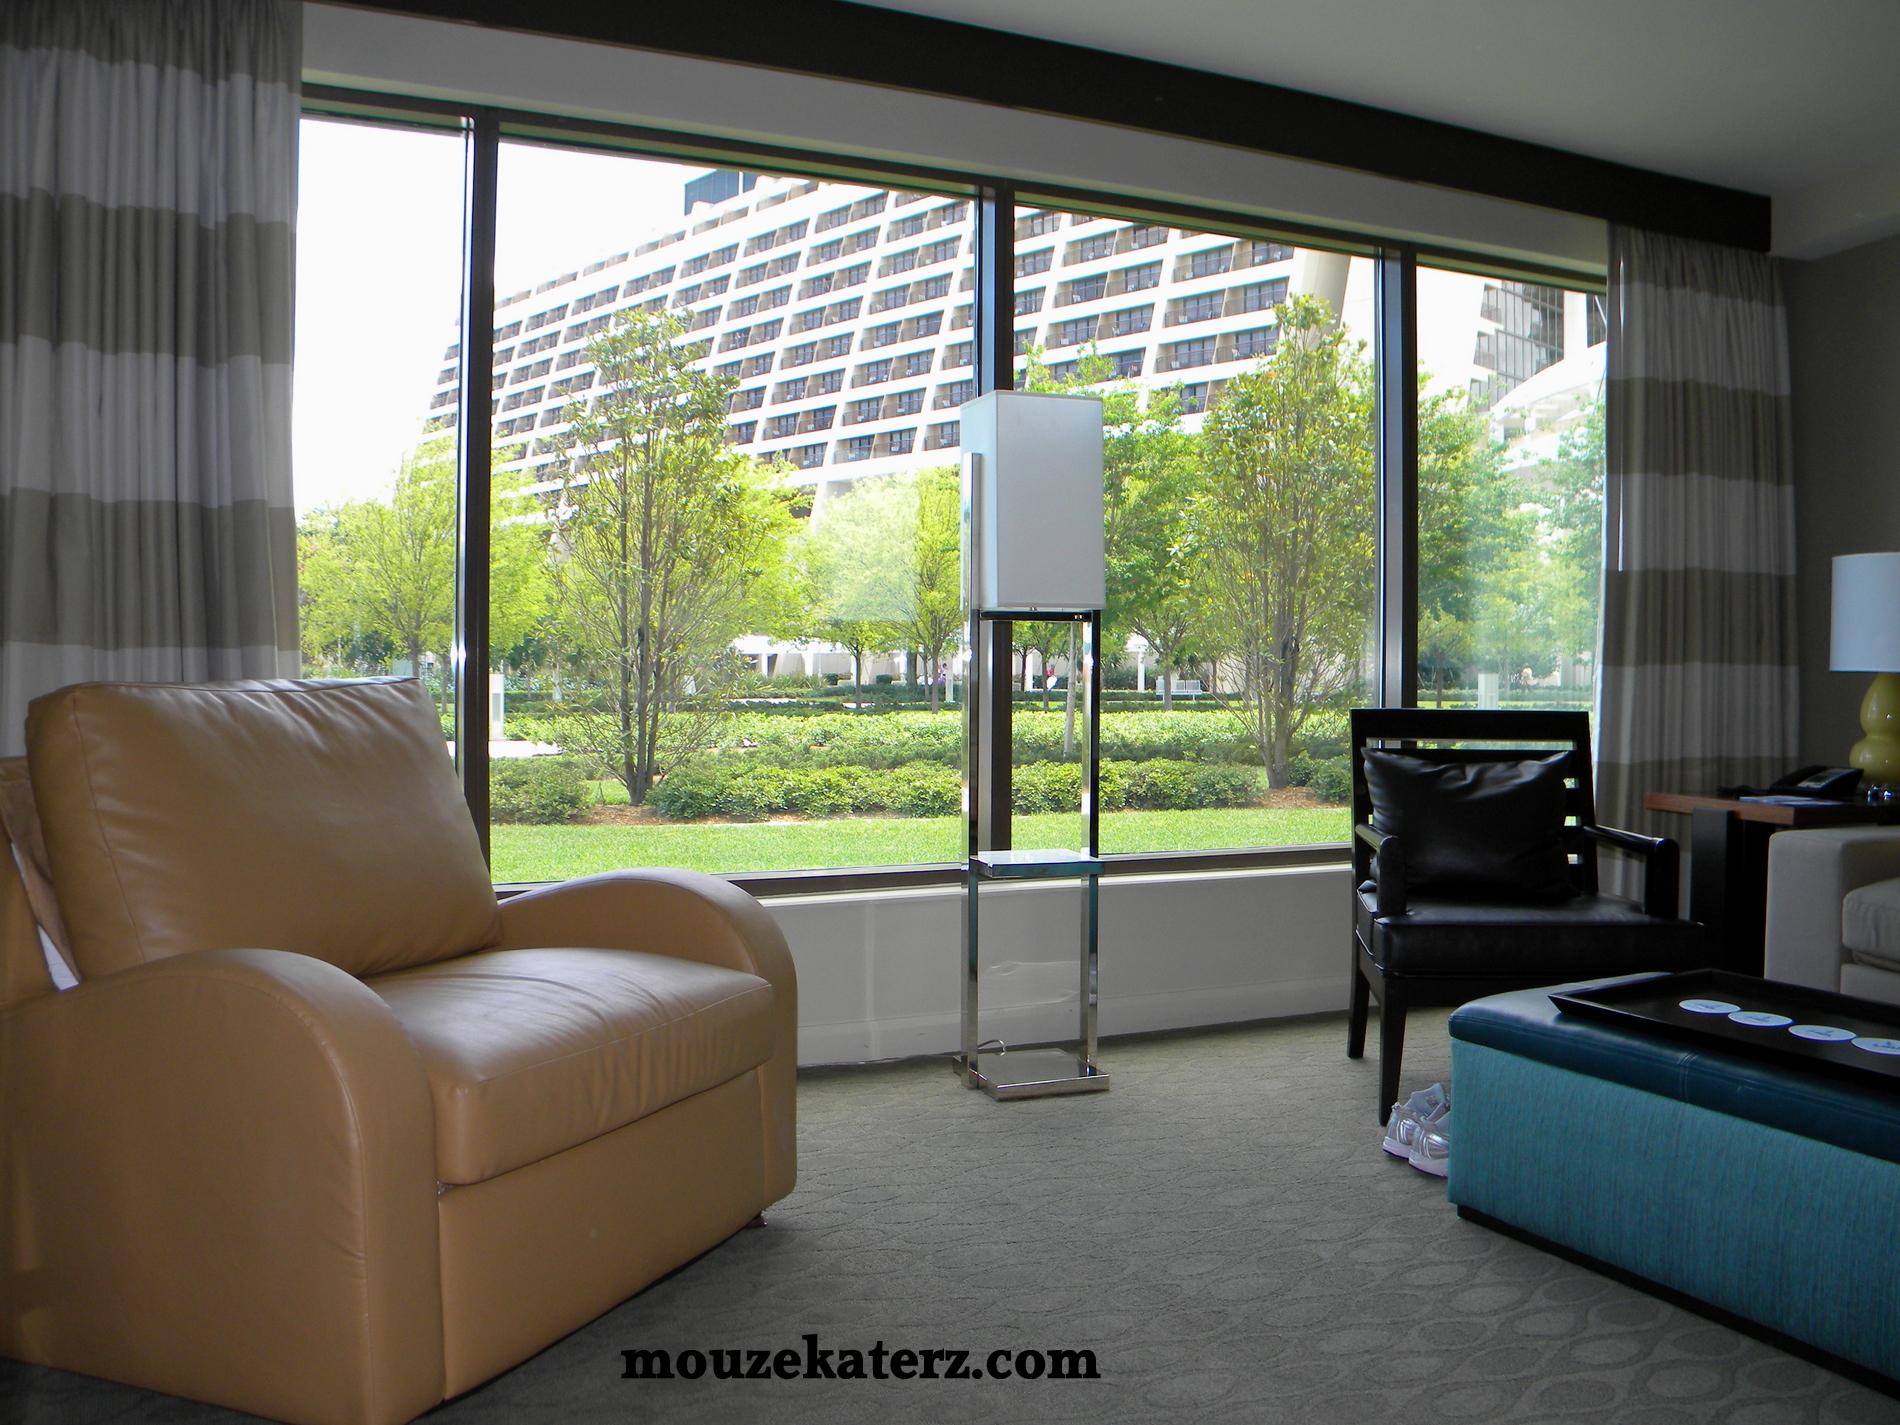 Disney S Bay Lake Tower Resort Is It Really Worth The Big Buck Mouze Kateerz